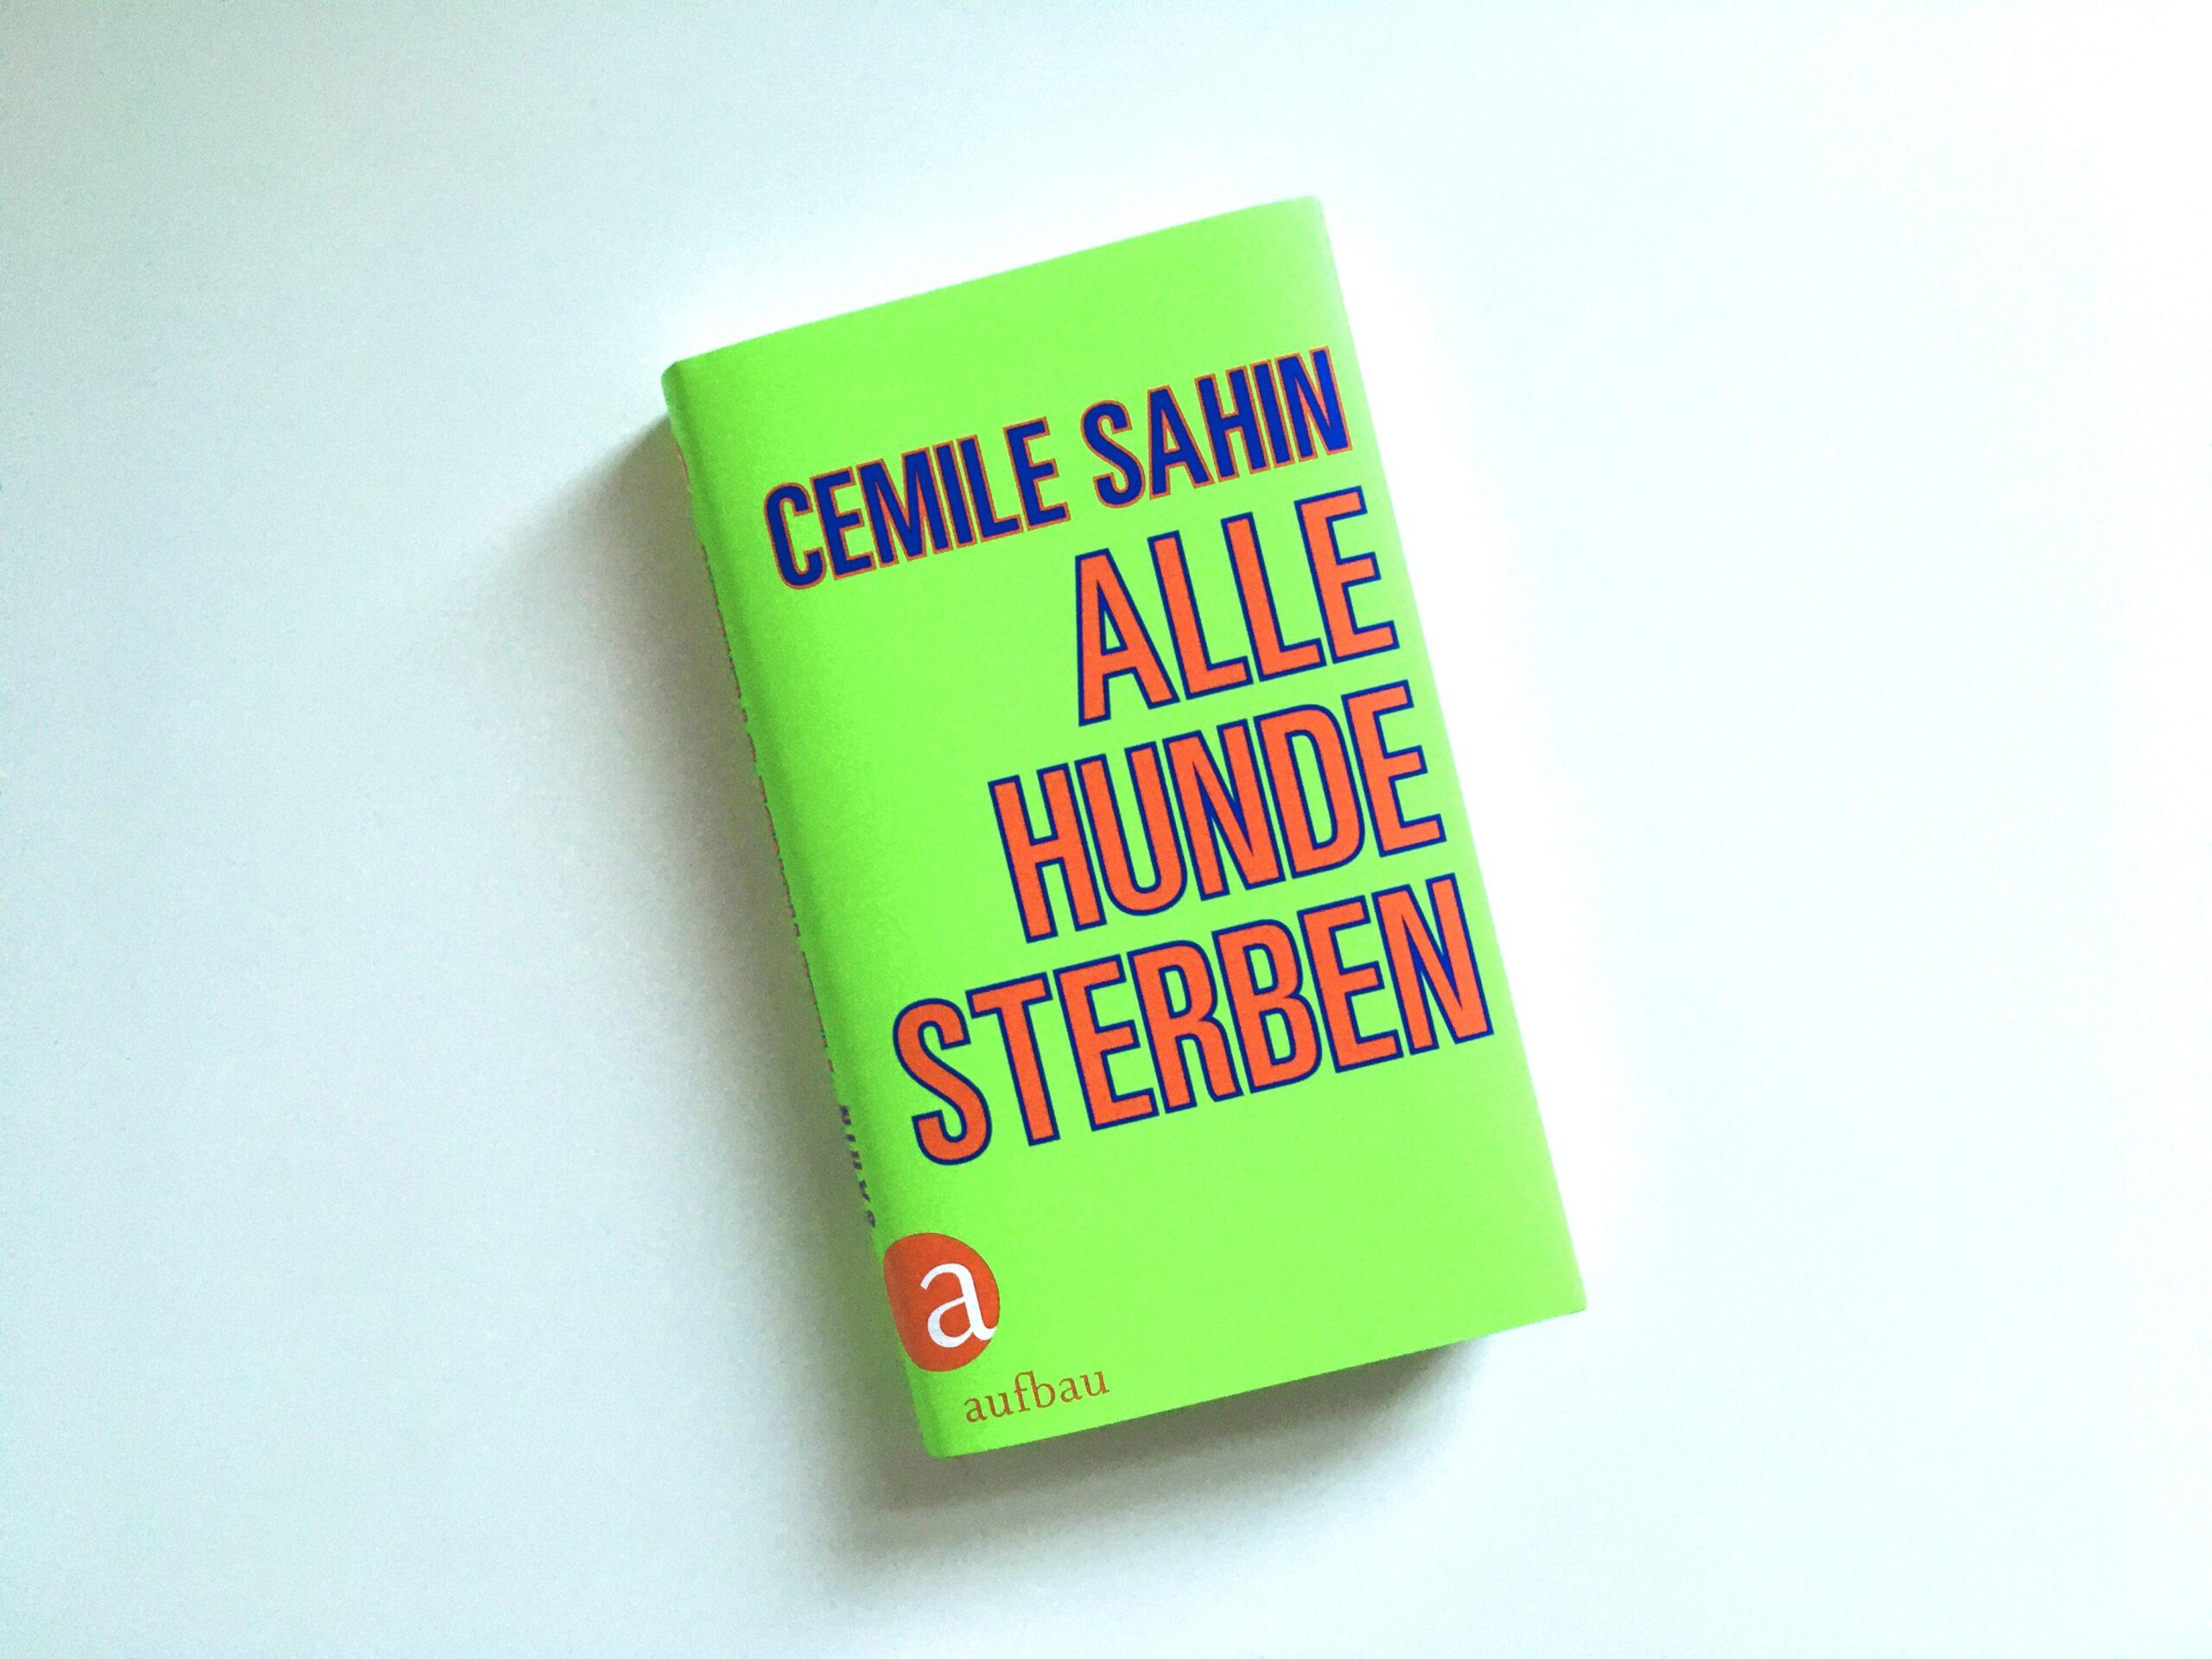 Cemile Sahin: Alle Hunde sterben